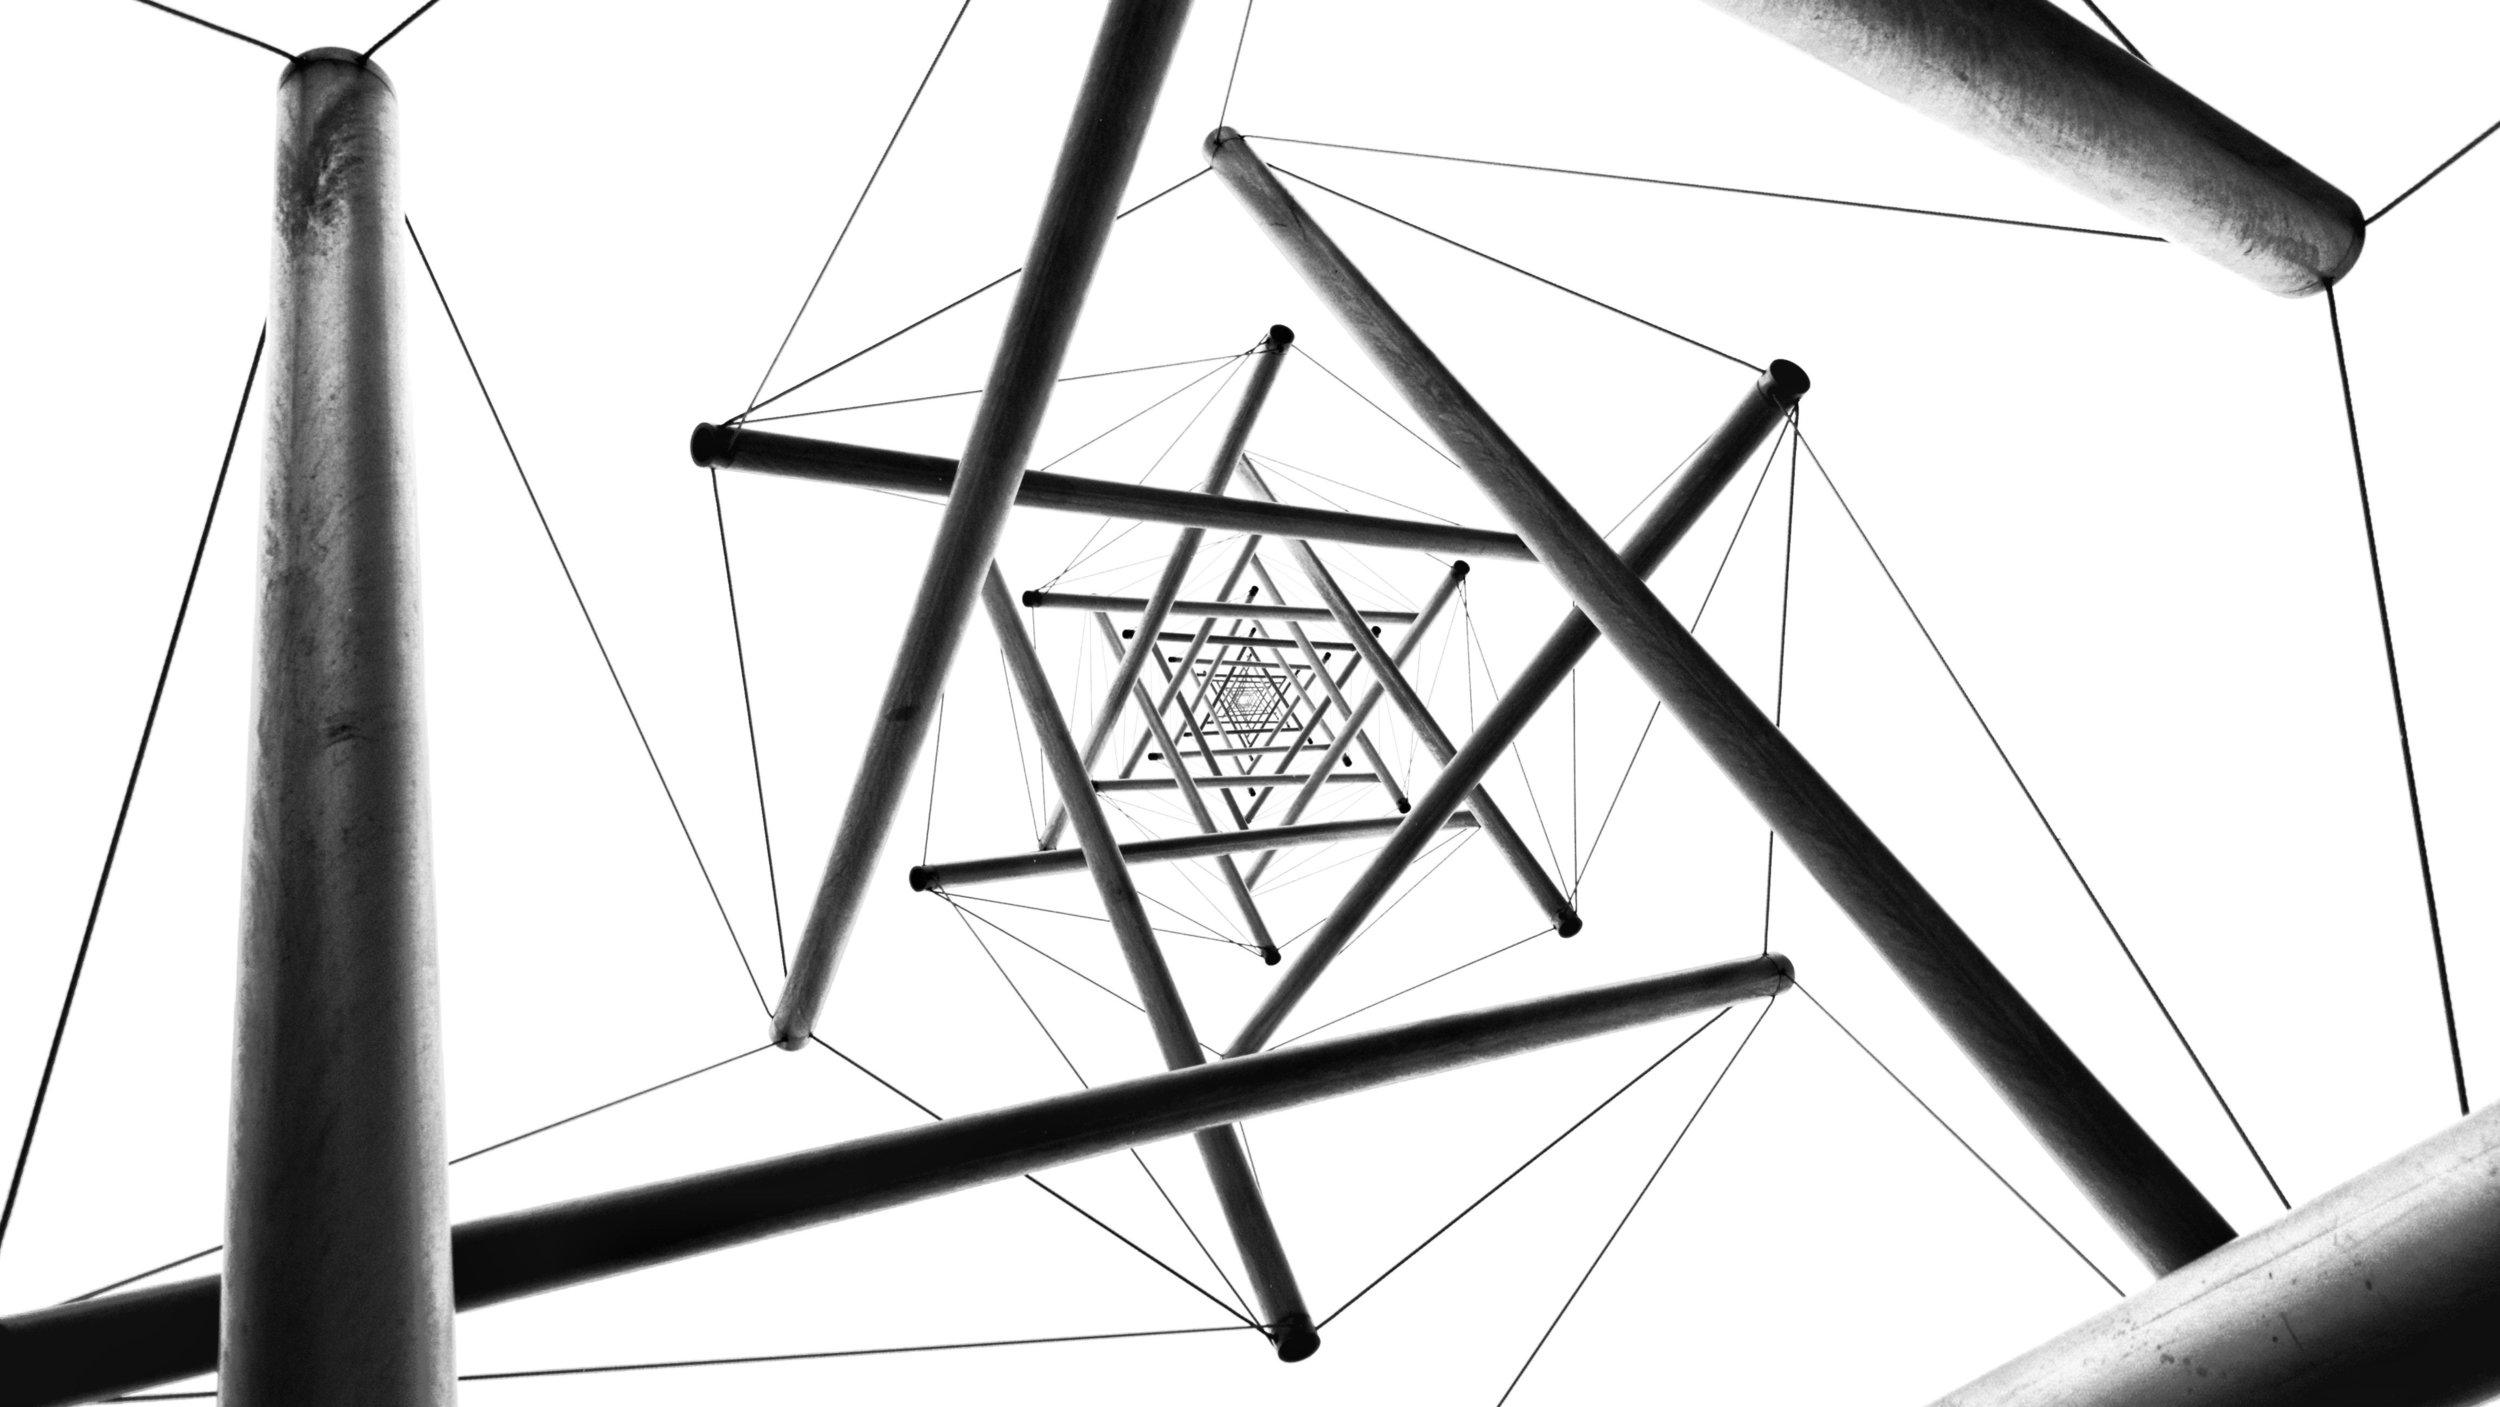 dhruv-weaver-618958-unsplash.jpg